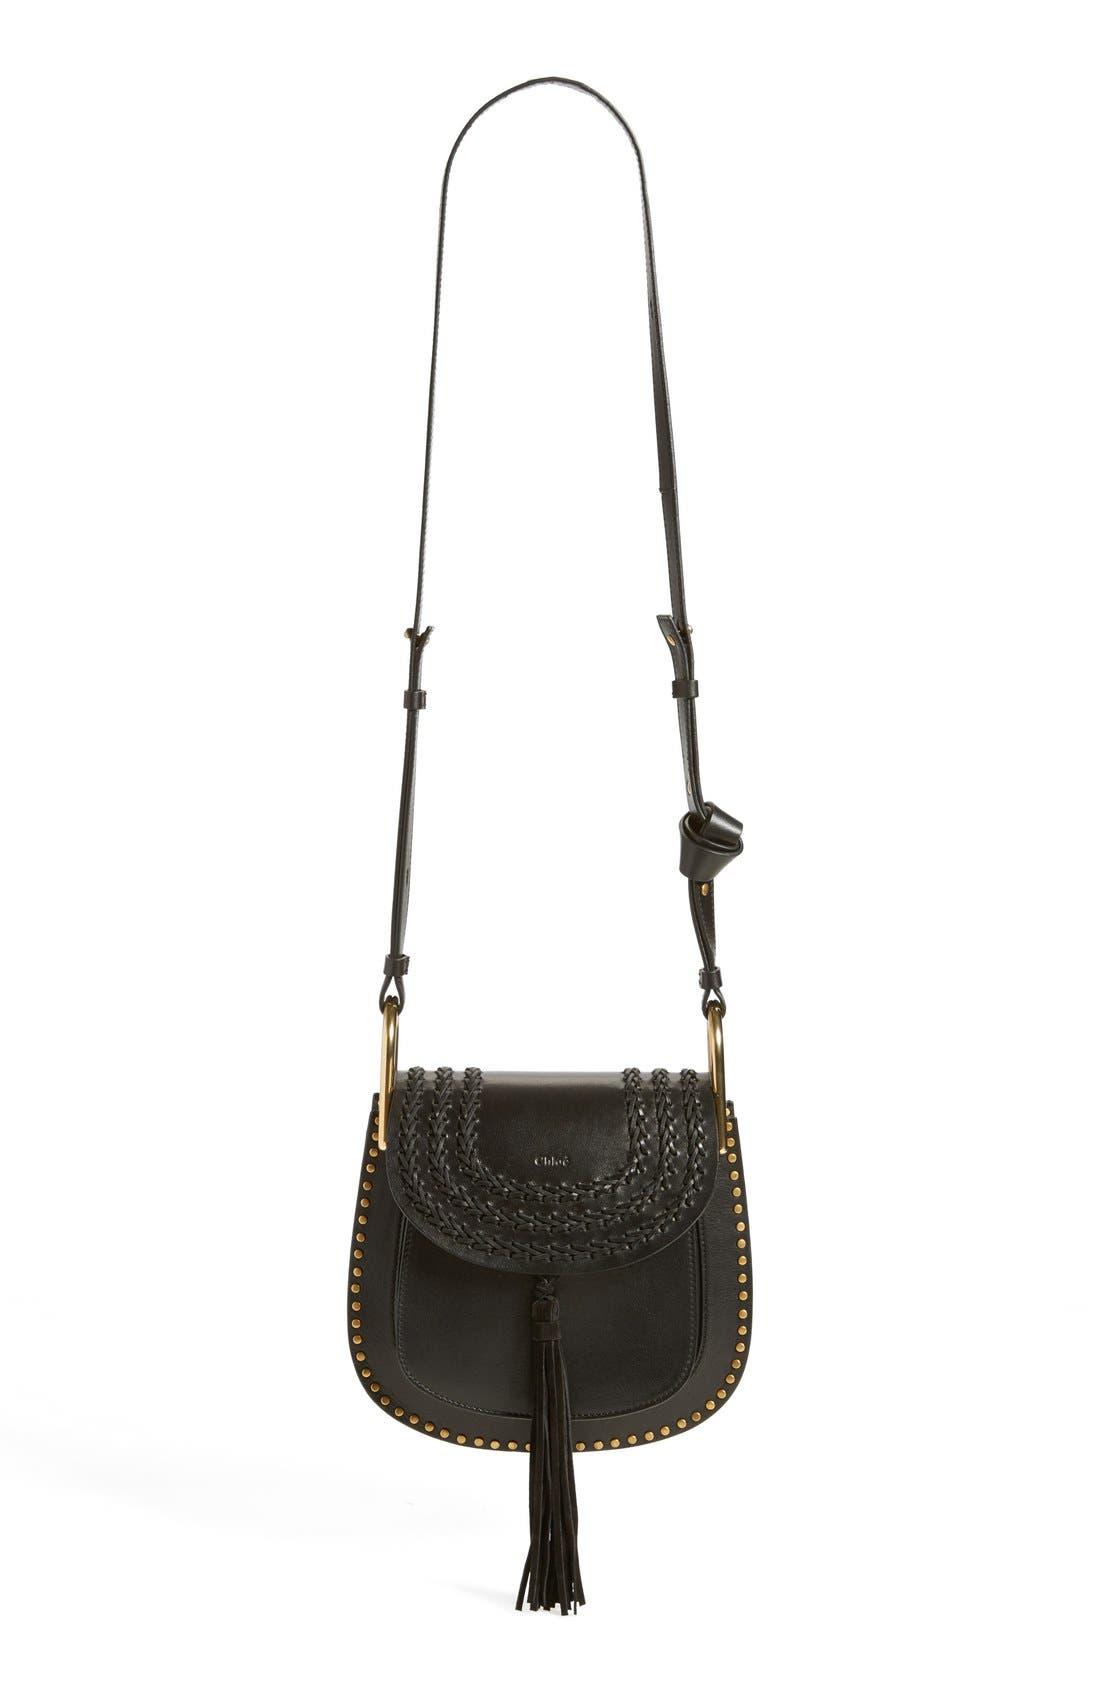 CHLOÉ,                             'Small Hudson' Studded Calfskin Leather Crossbody Bag,                             Alternate thumbnail 3, color,                             001